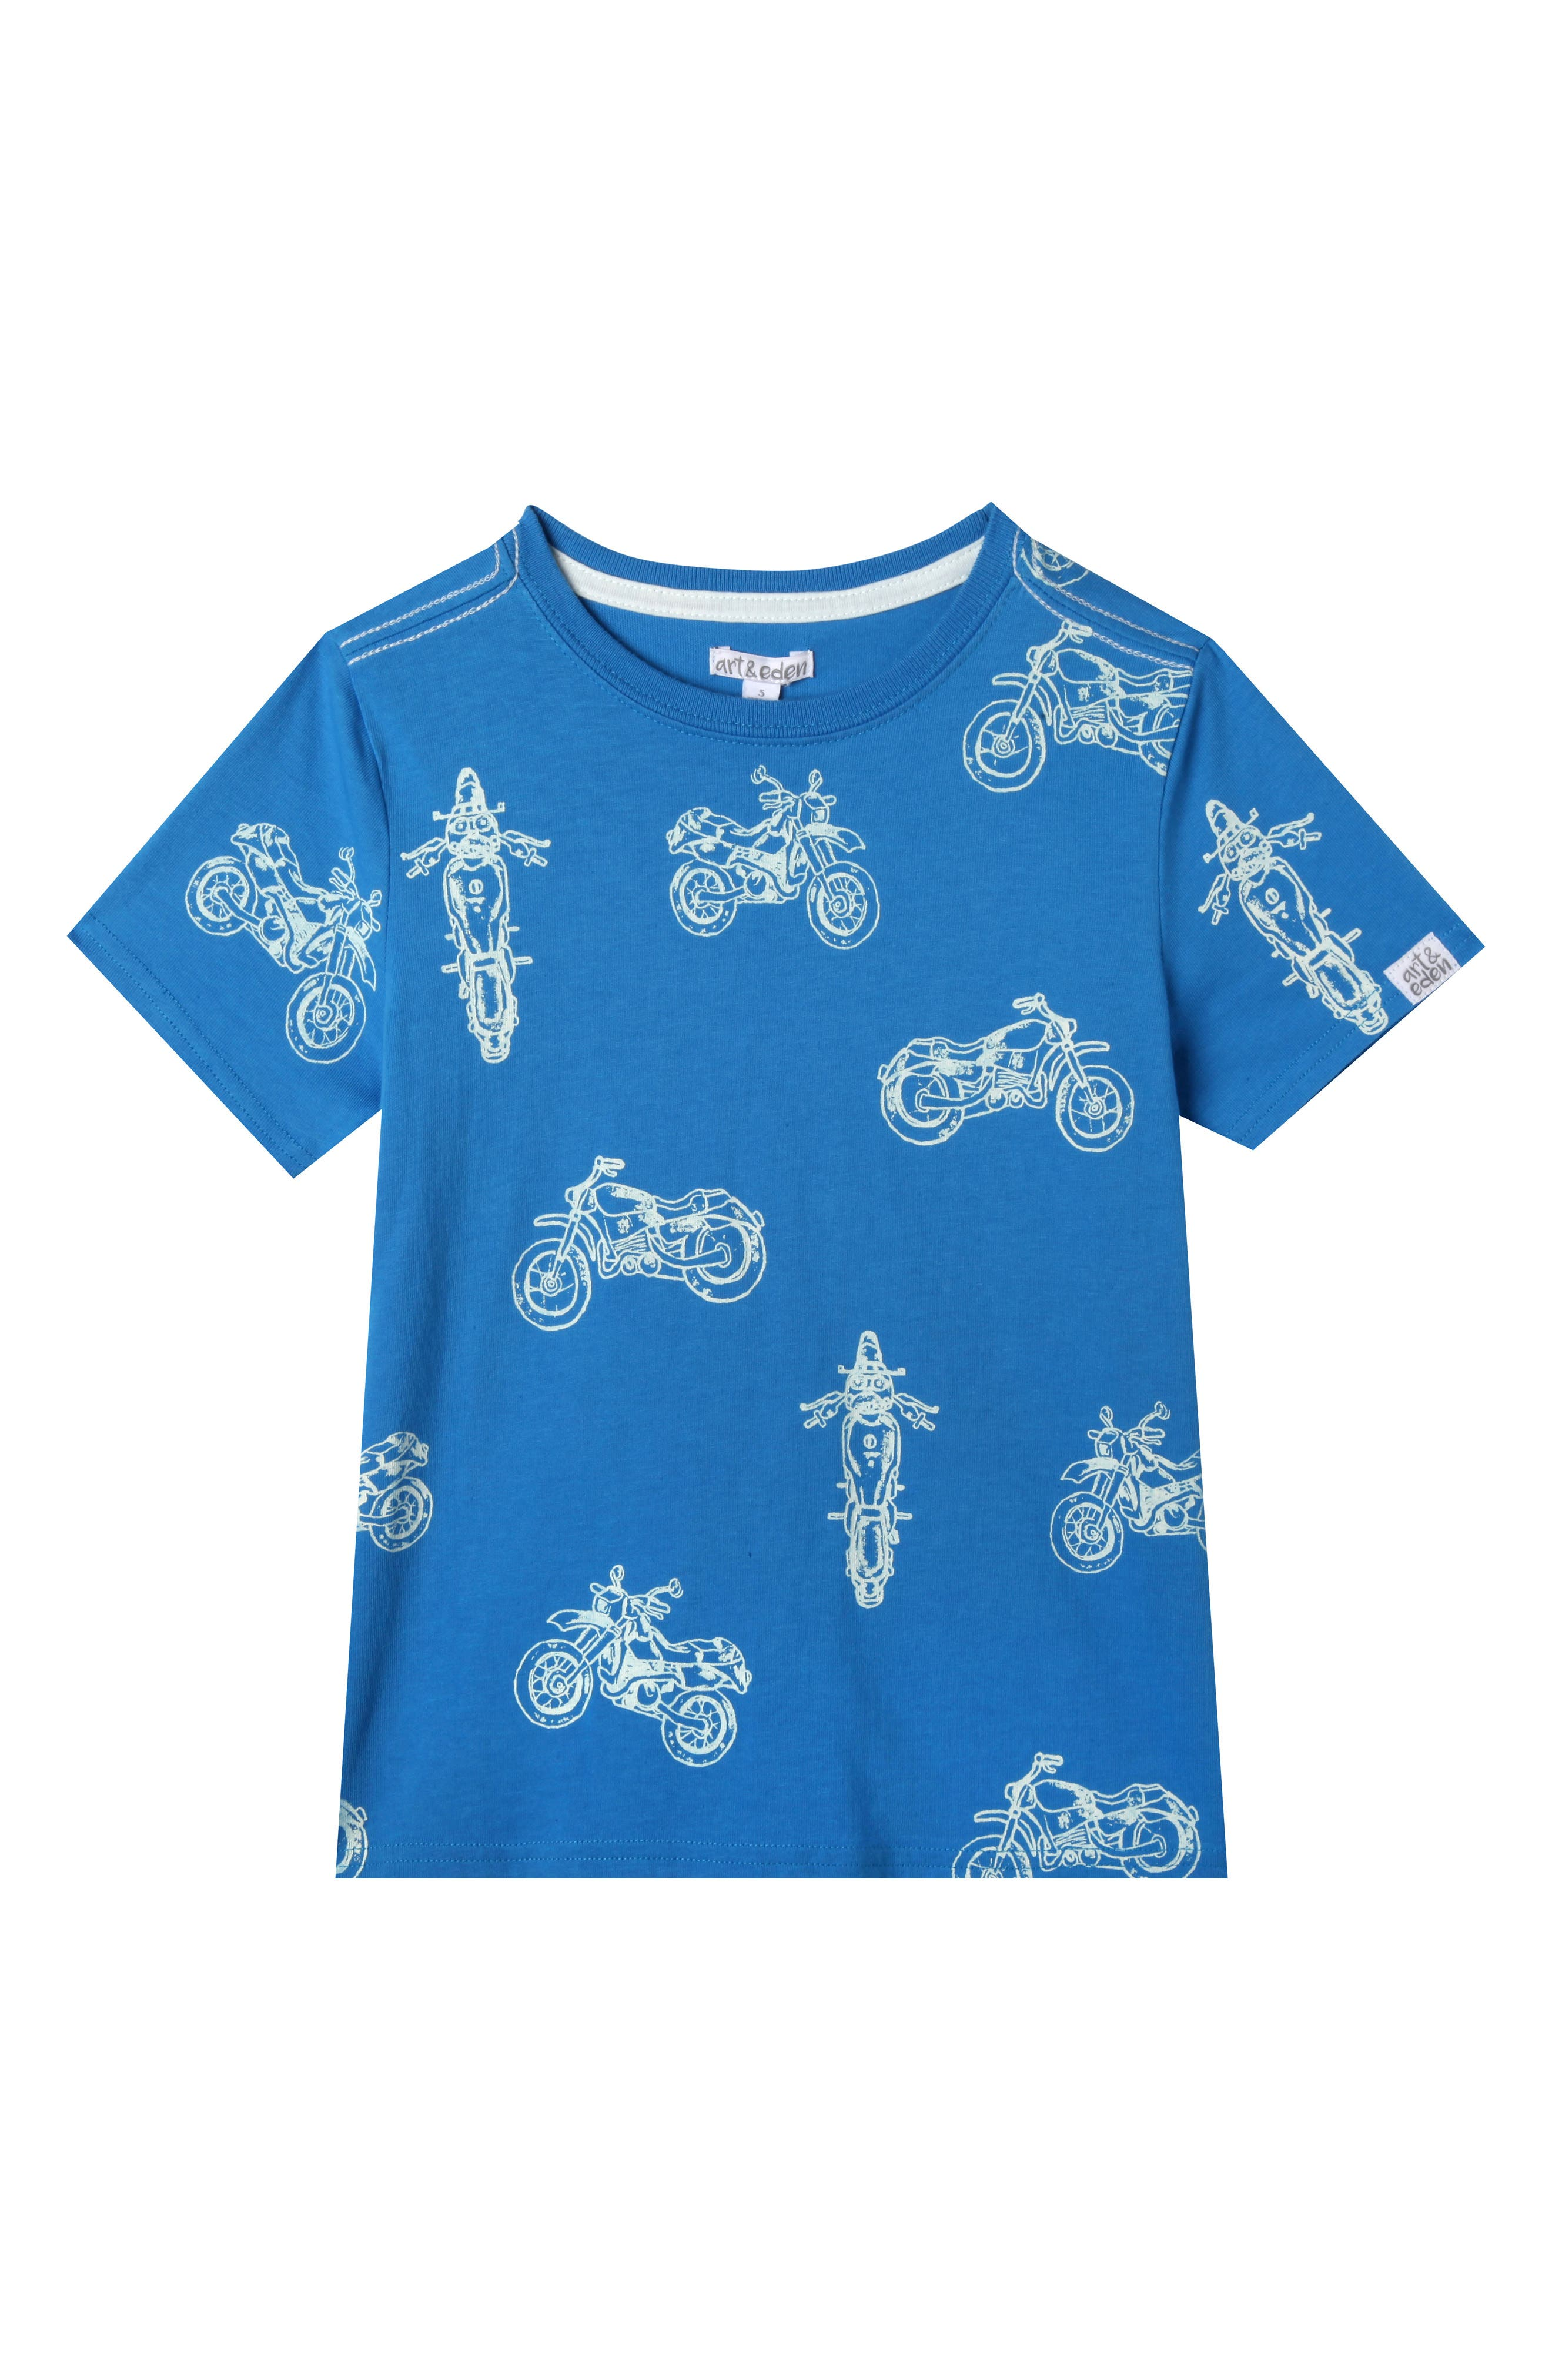 Sebastian Motorcycle Organic Cotton T-Shirt,                             Main thumbnail 1, color,                             French Blue